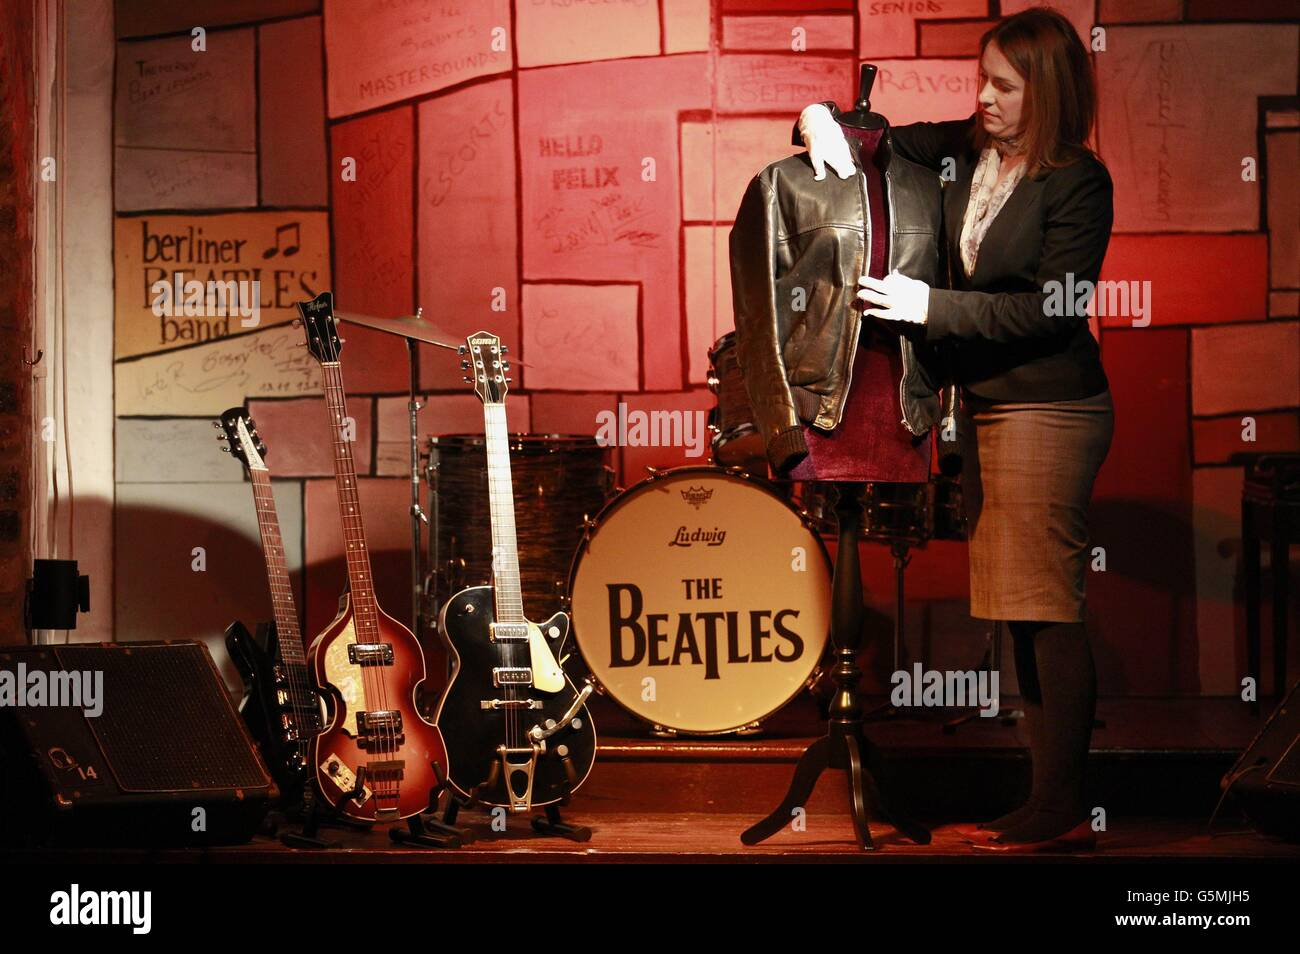 George Harrison jacket sale - Stock Image